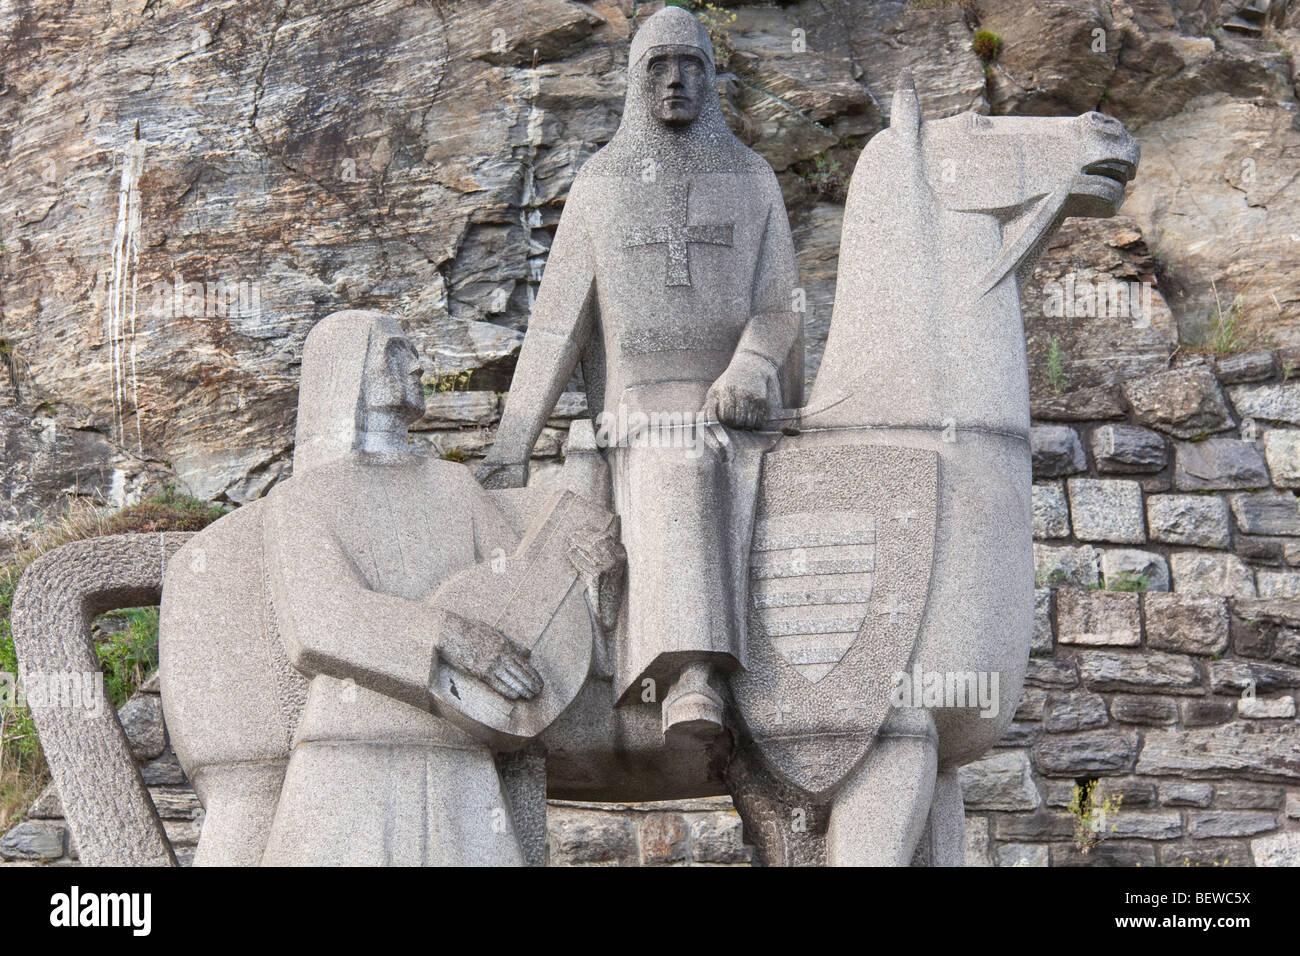 Sculpture of Richard Lionheart and Blondel de Nesle near Duernstein, Austria - Stock Image